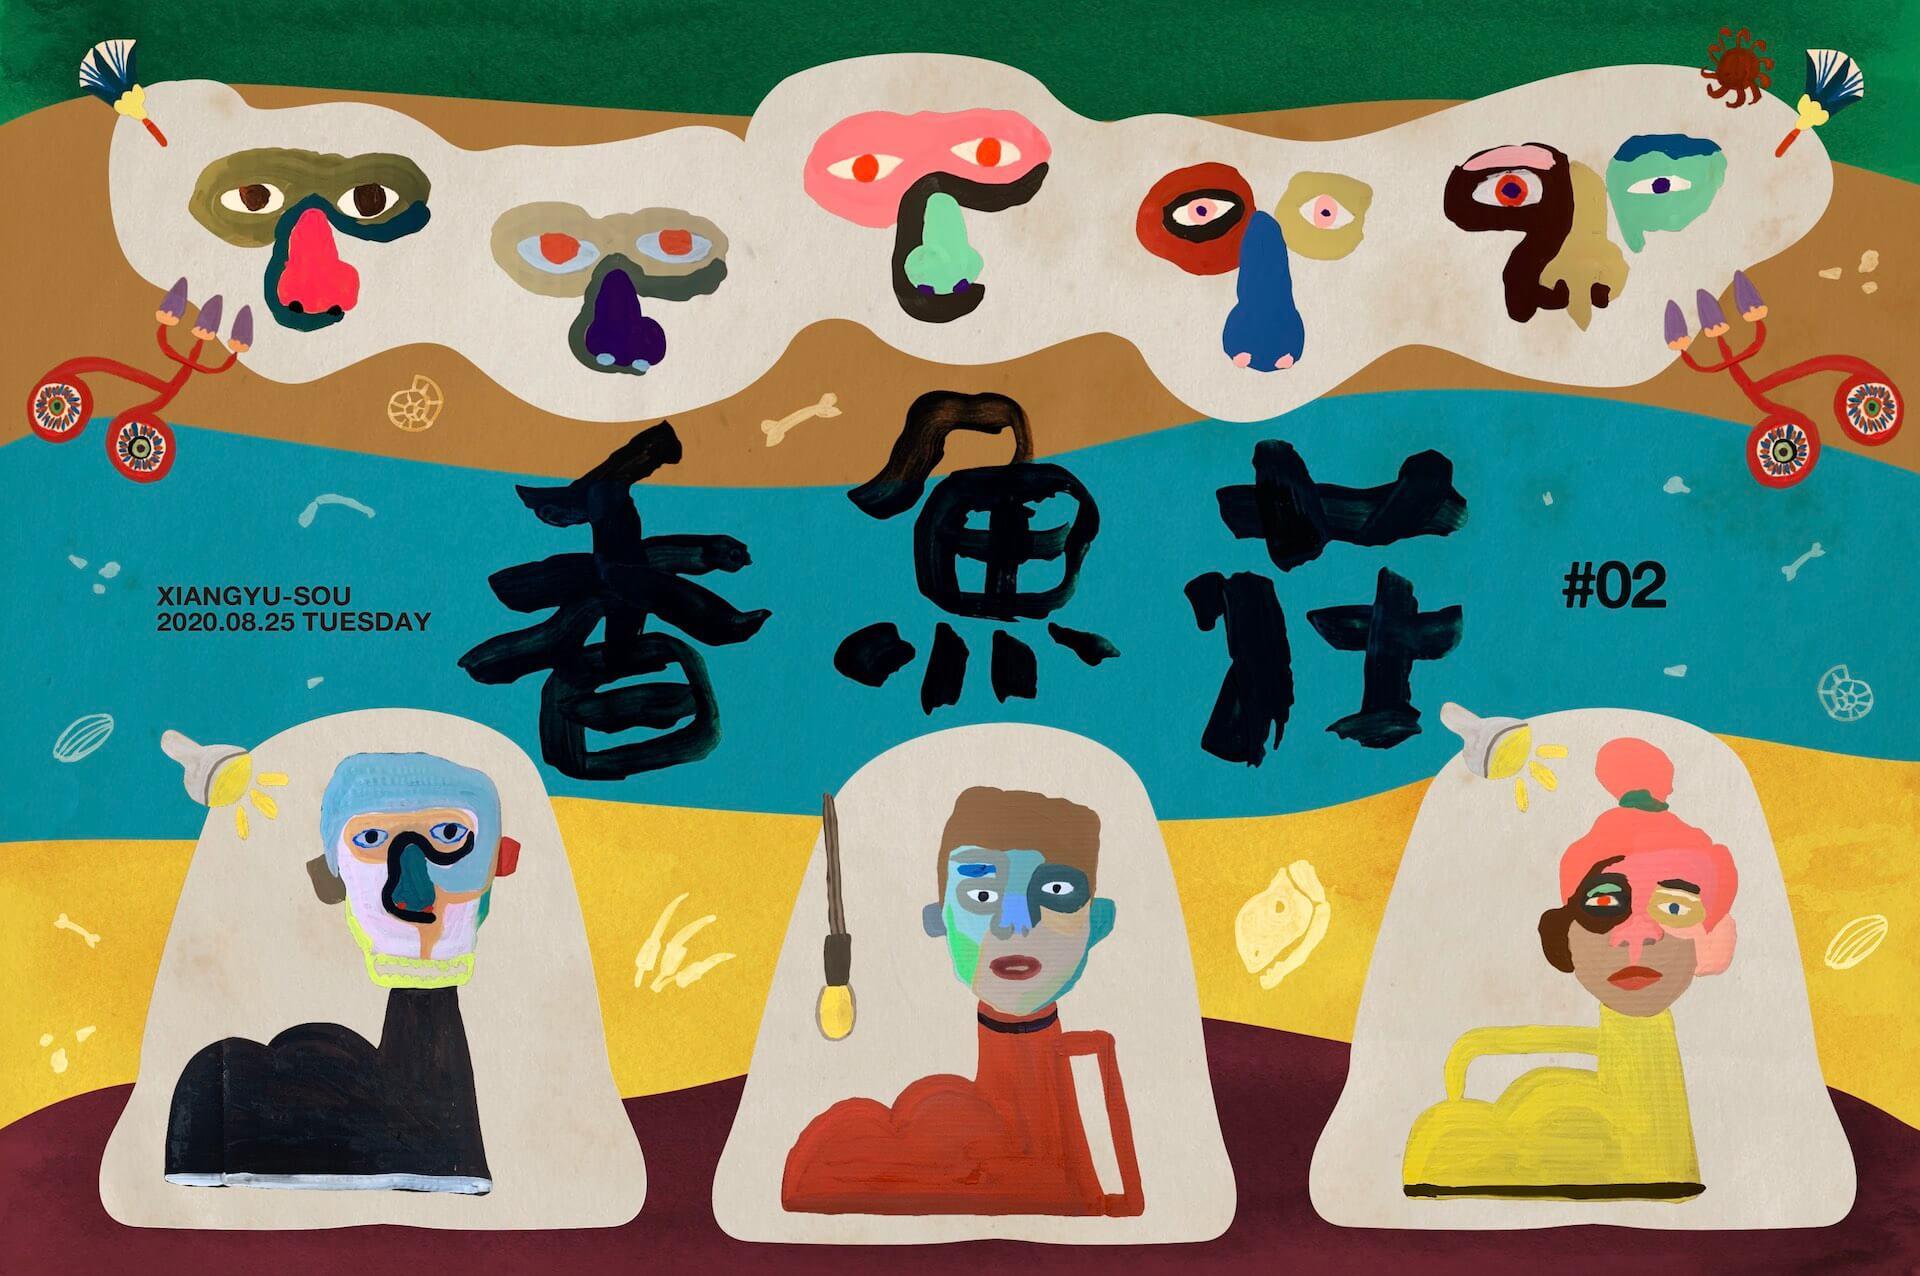 "xiangyu、山好きならではなエピソードを綴った新曲""Y△M△""をリリース <香魚荘#02>のラインナップにテニスコートら追加 music200724_xiangyu_3"